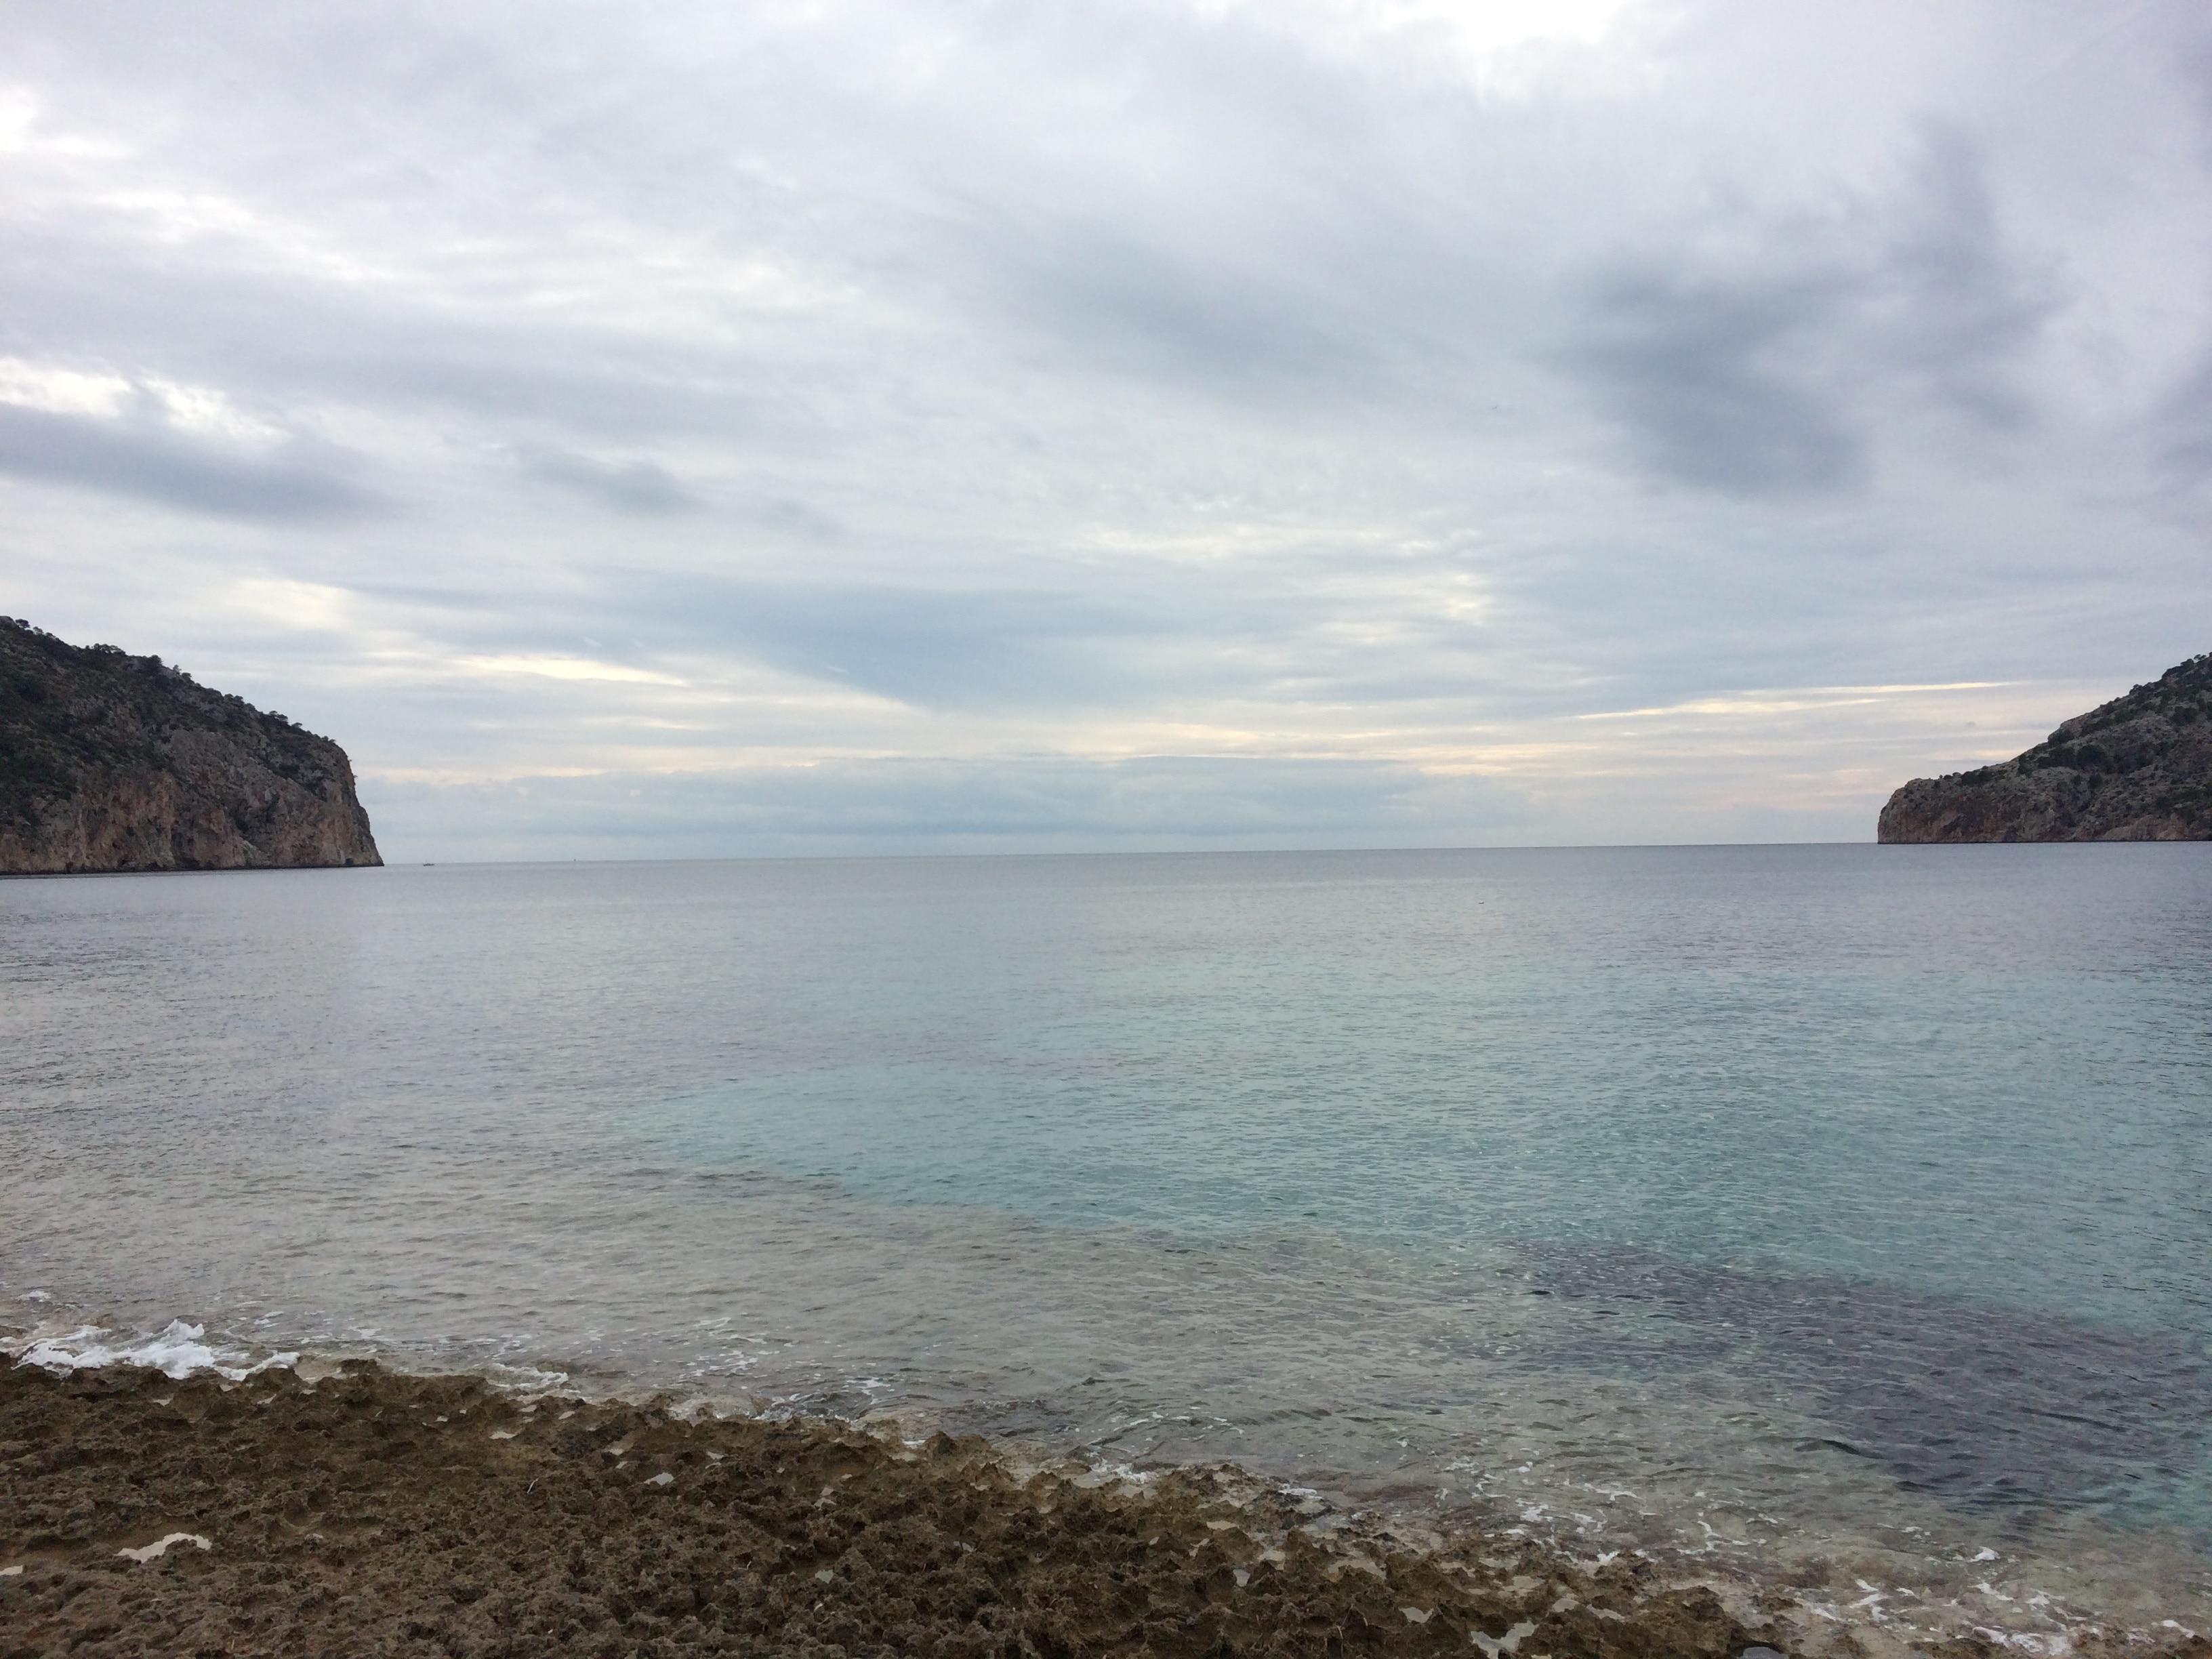 Camp de Mar, Andraitx, Balearic Islands, Spain